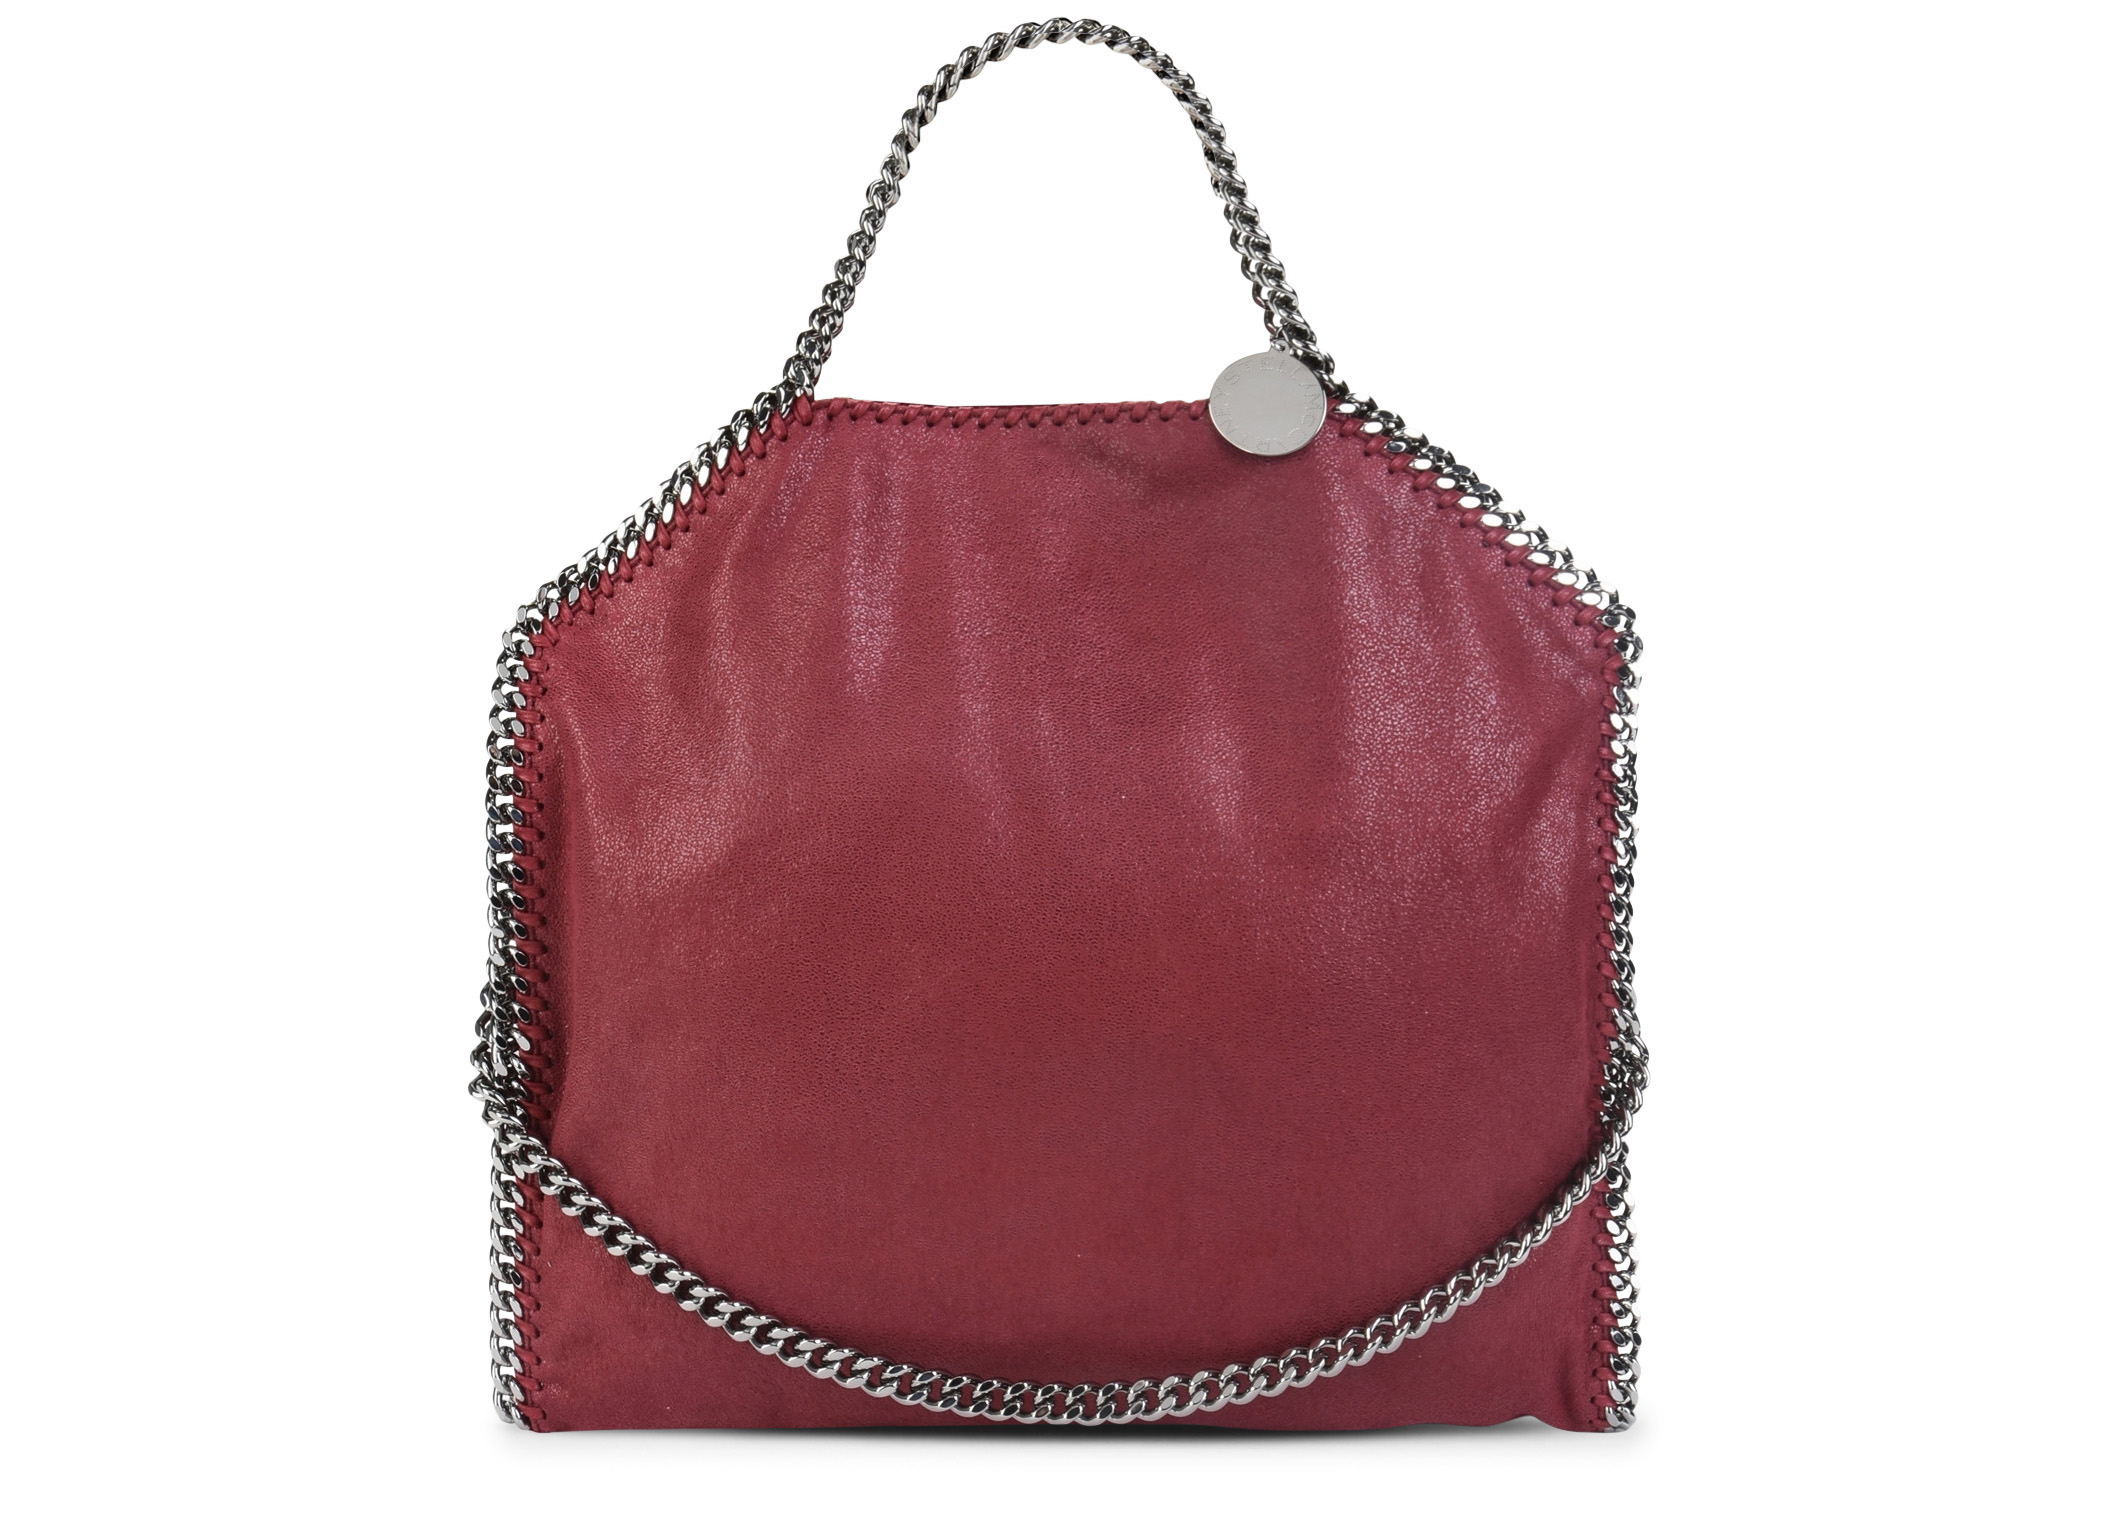 4db1fa16b5c34 Shop Stella Mccartney Totes for Women | ModeSens